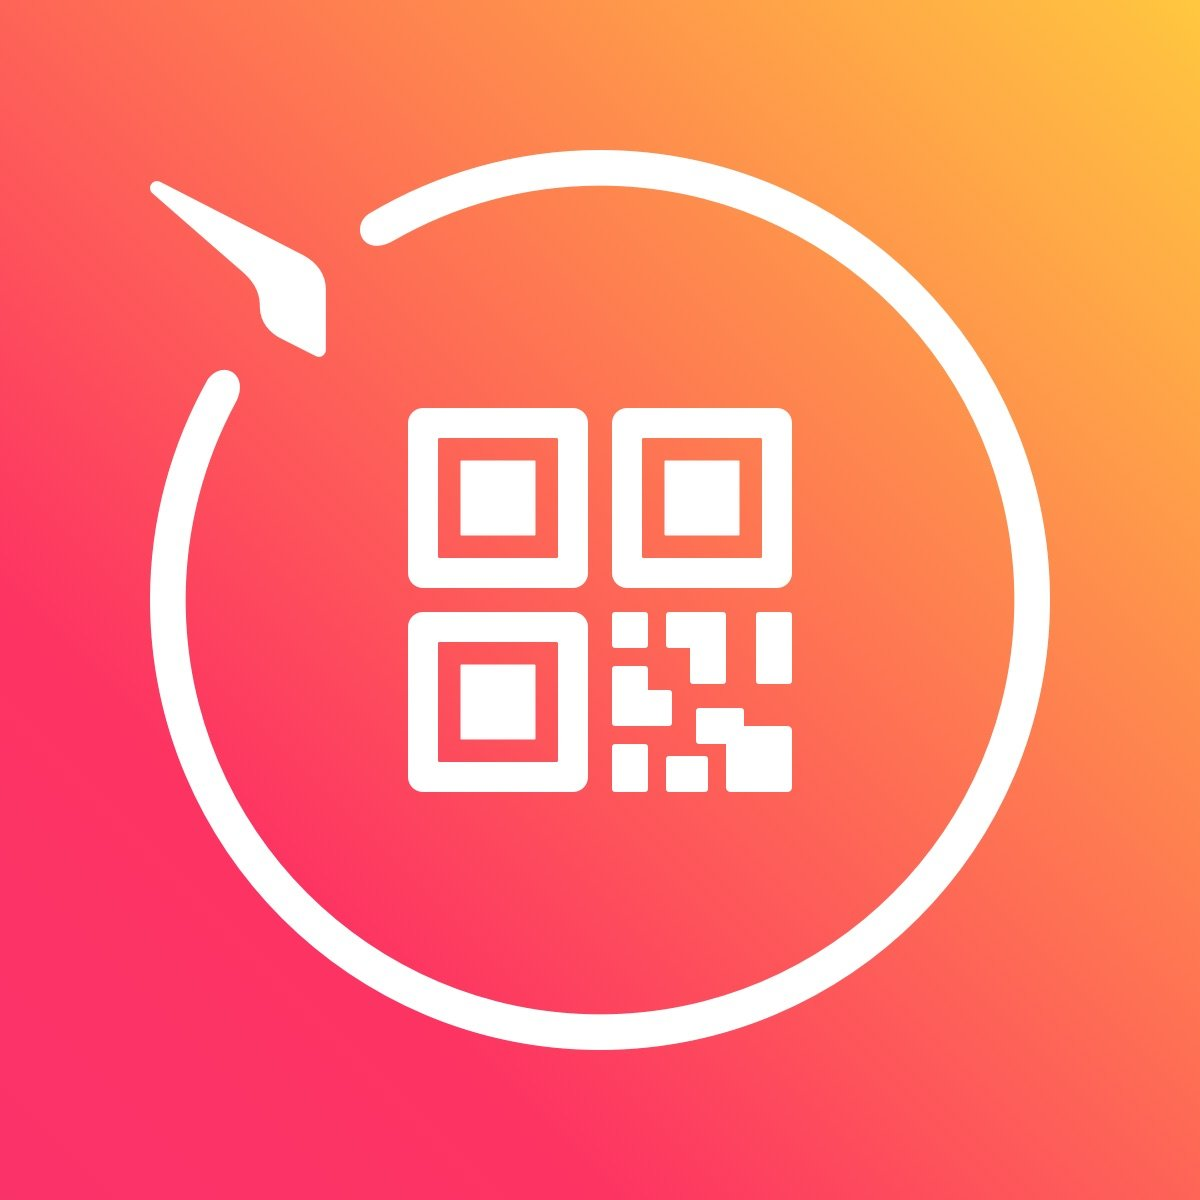 Shopify QR Code Generator app by Elfsight